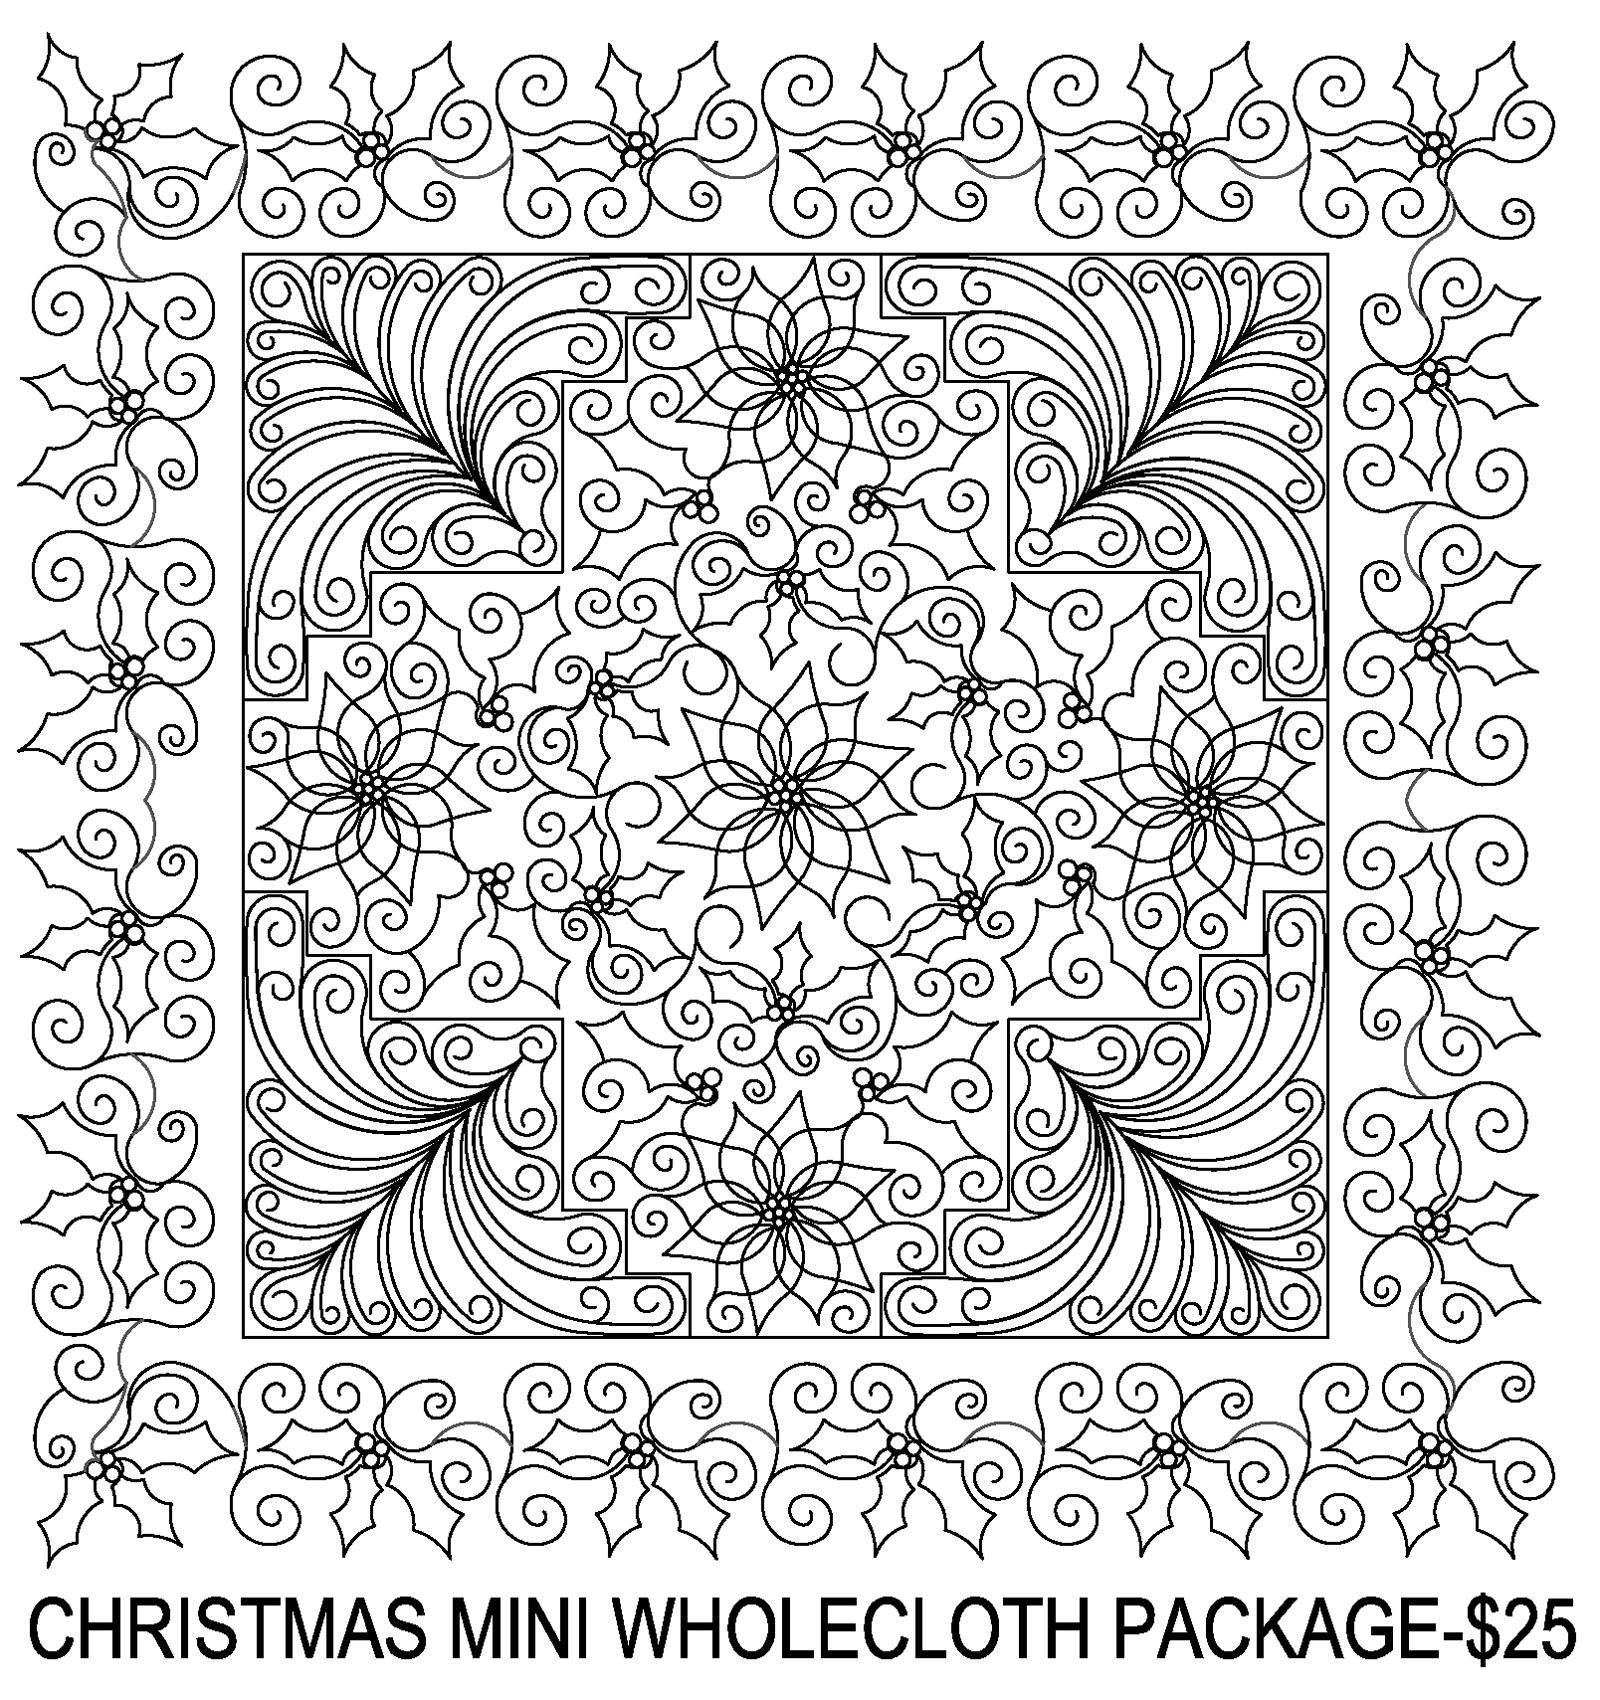 Designs by Deb - Offers digital longarm quilting designs as ... : digital longarm quilting patterns - Adamdwight.com